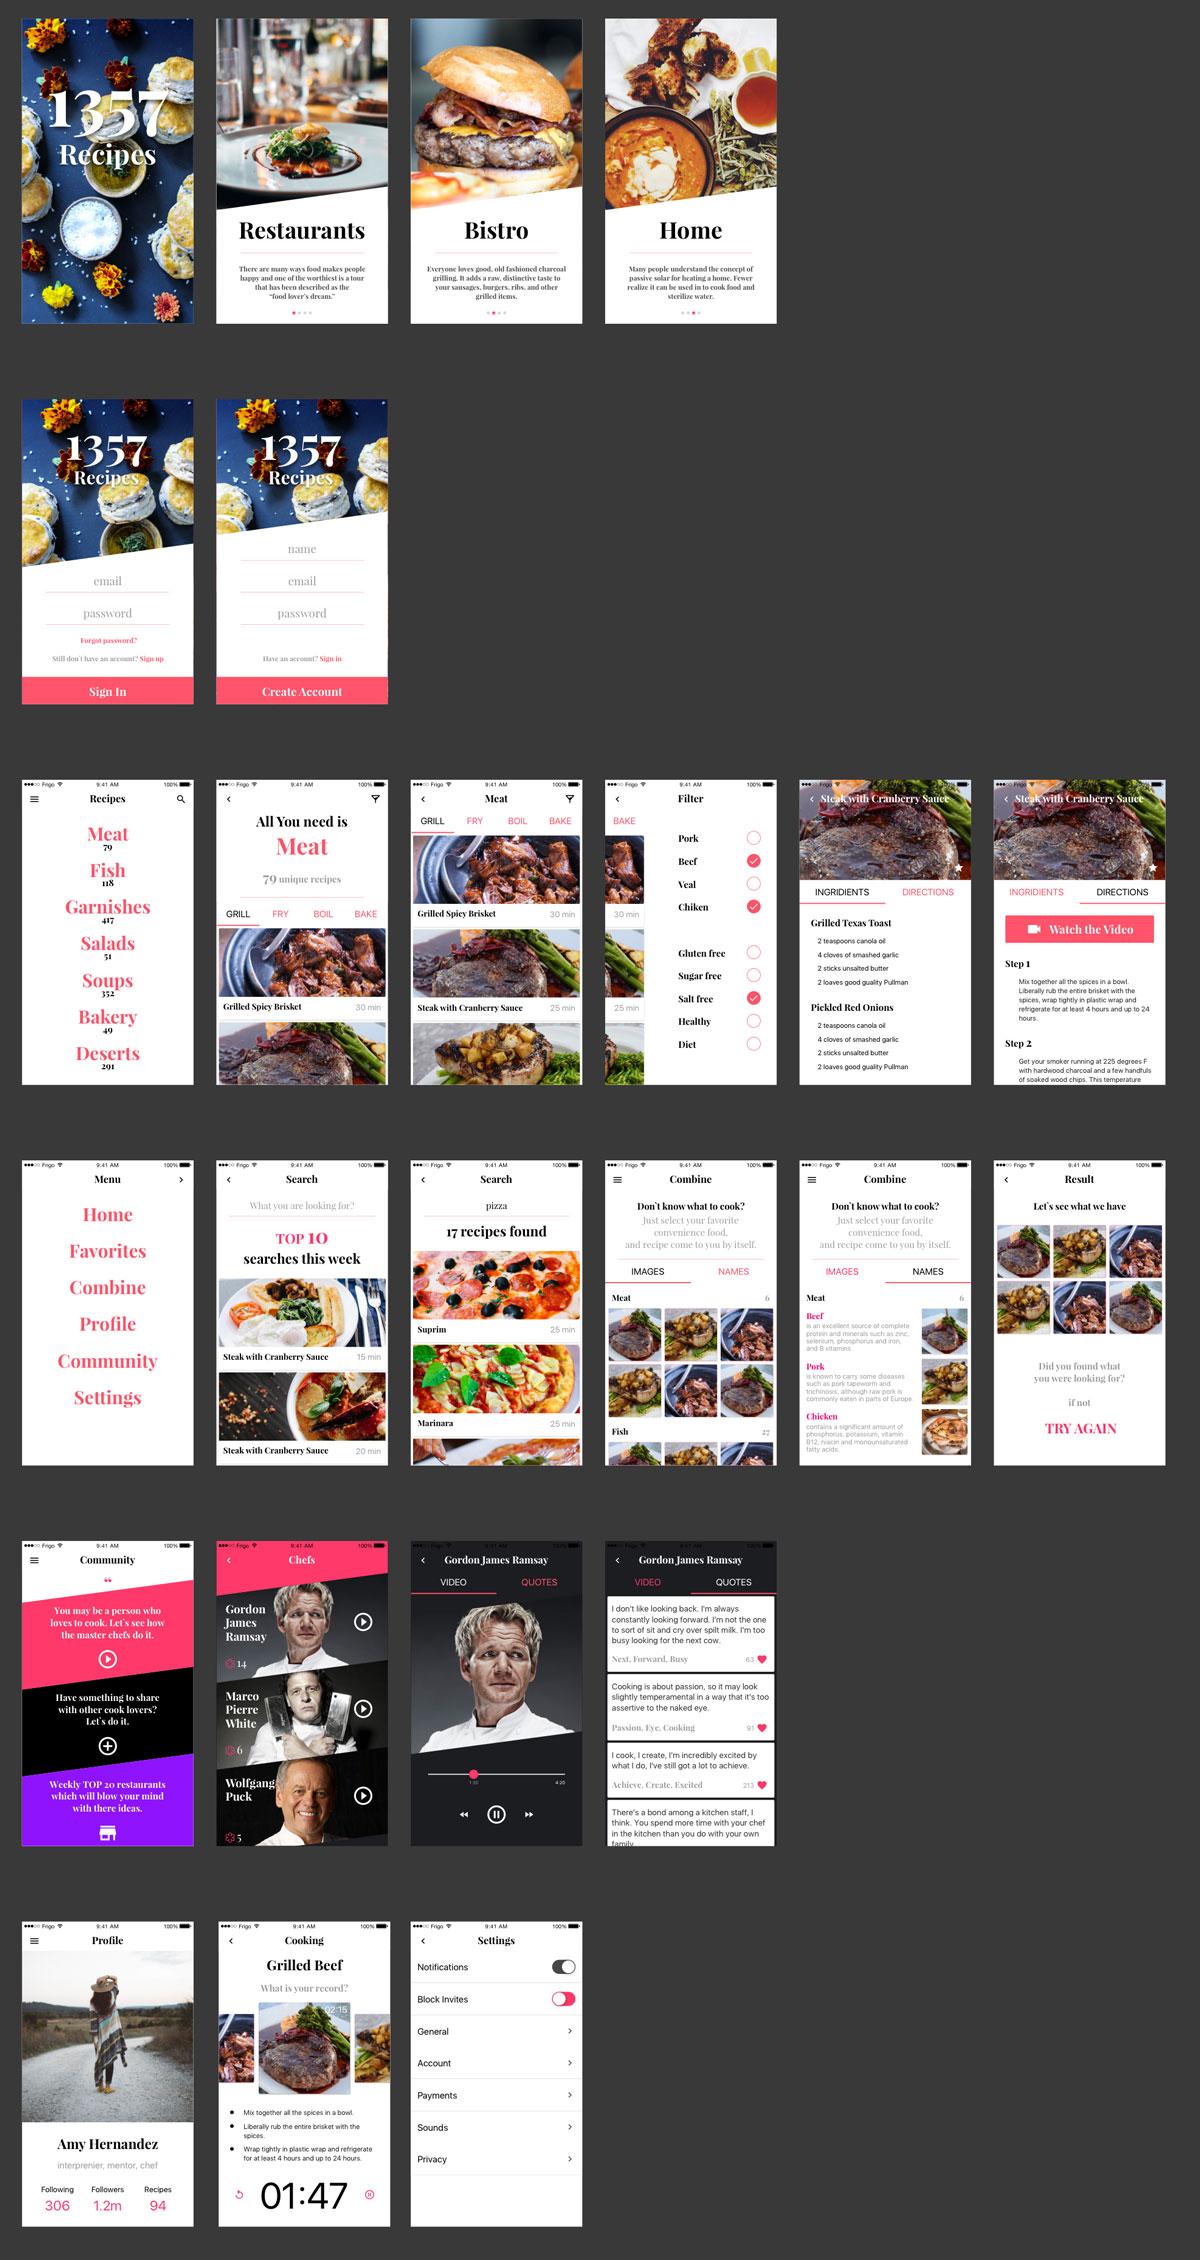 1357 Recipe App UI Kit - 现代优雅的 Sketch 电子商务 UI 套件,在您的下一个项目中有 25 个基本屏幕。